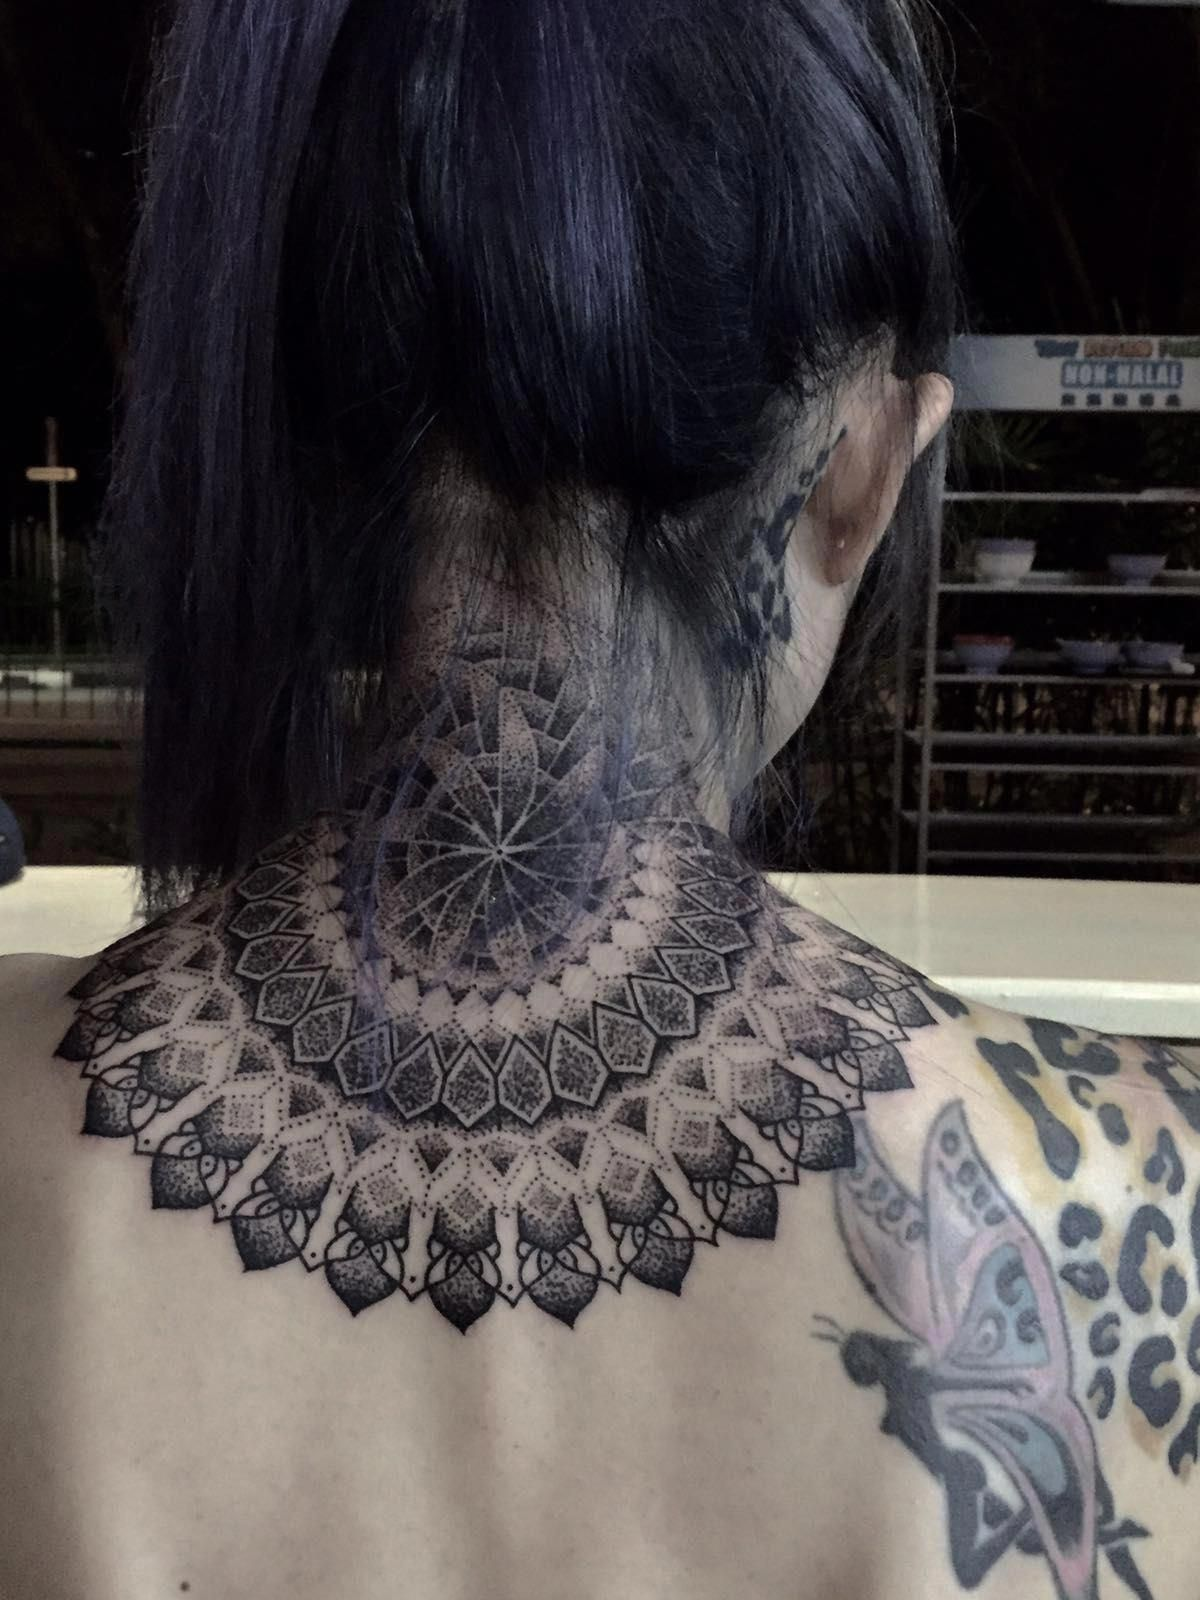 amber rose tattoos on back Tattoosonback Nape tattoo